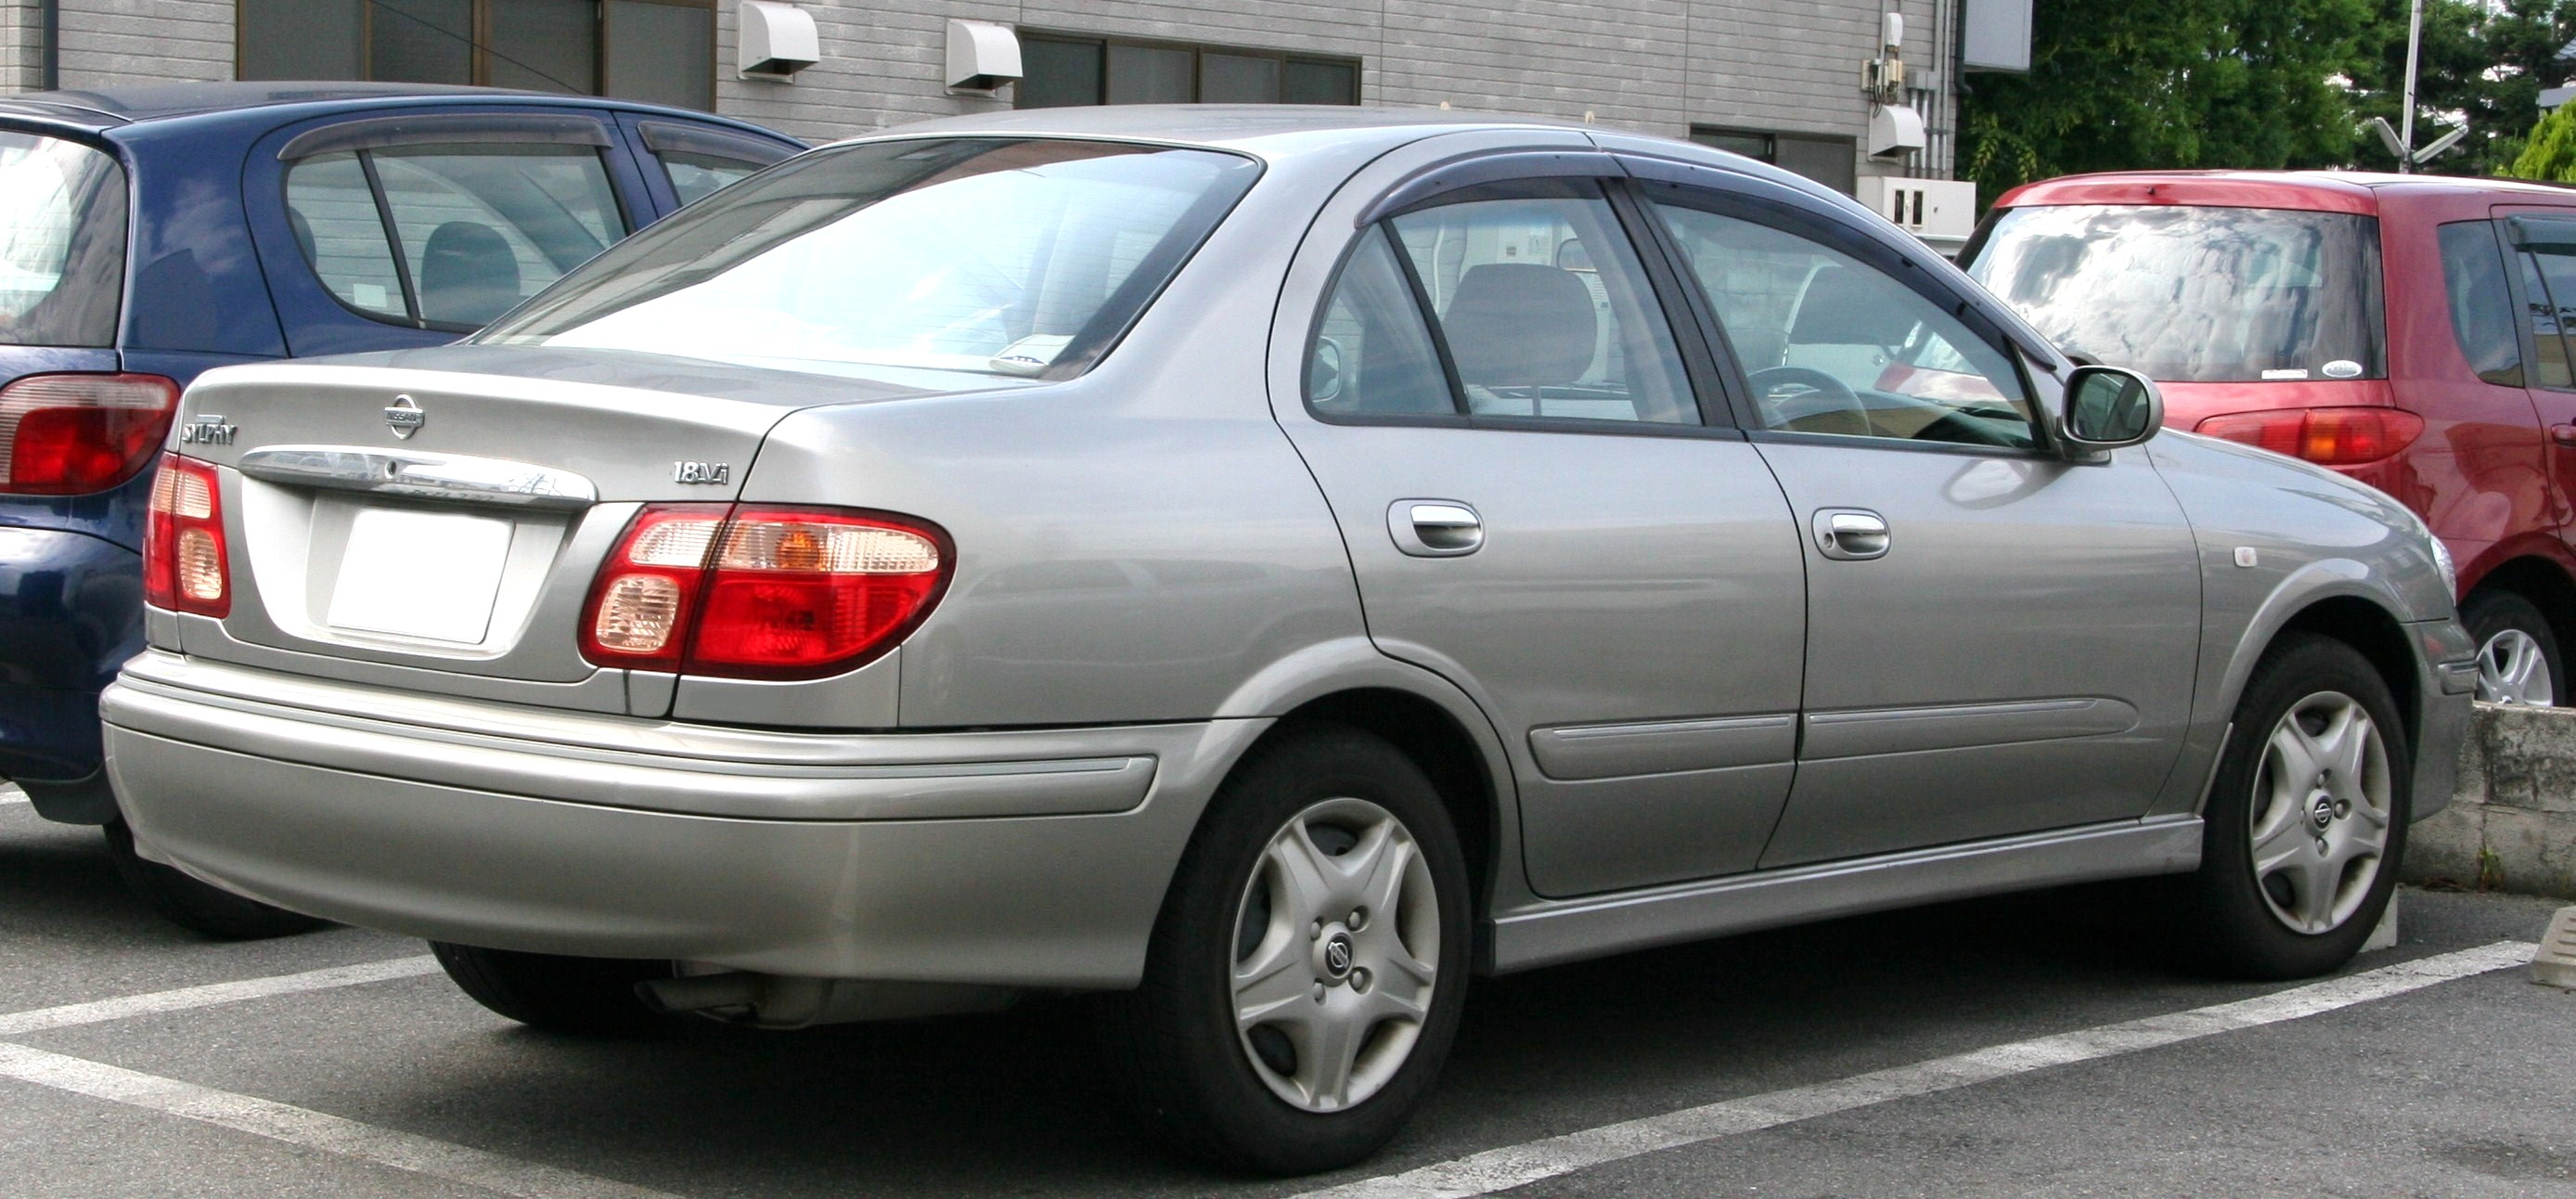 Nissan Bluebird Sylphy I (G10) 2000 - 2005 Sedan #6